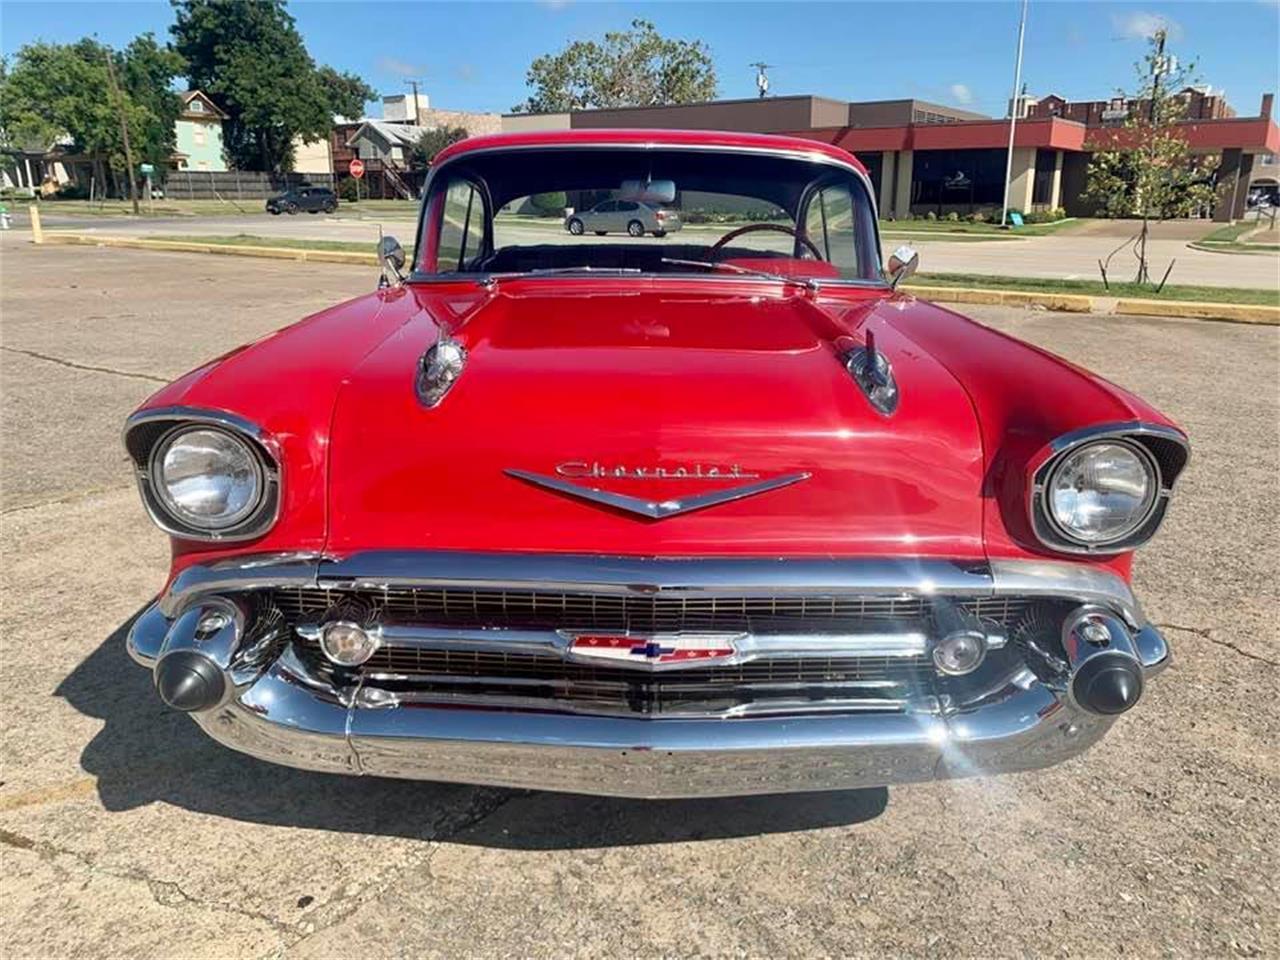 1957 Chevrolet Bel Air (CC-1385431) for sale in Denison, Texas